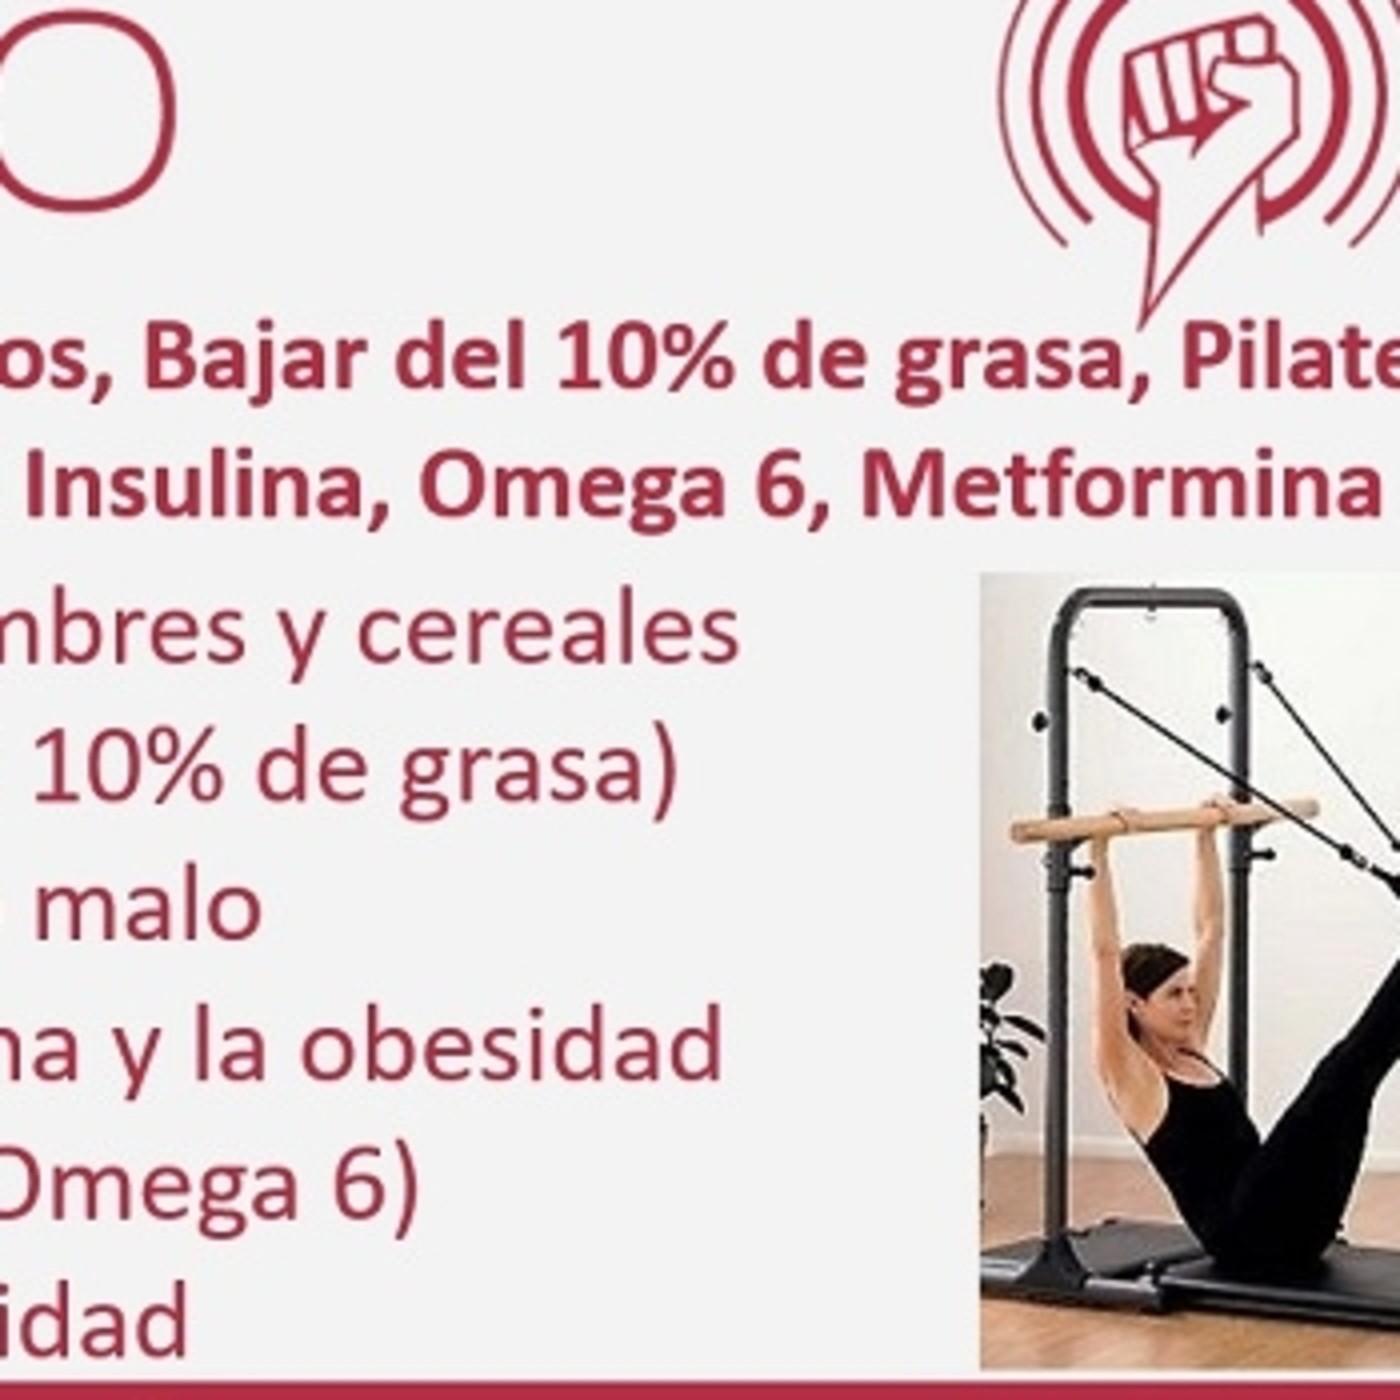 203: Alimentos Germinados, Bajar del 10% de grasa, Pilates para Mujeres, Obesidad e Insulina, Omega 6, Metformina